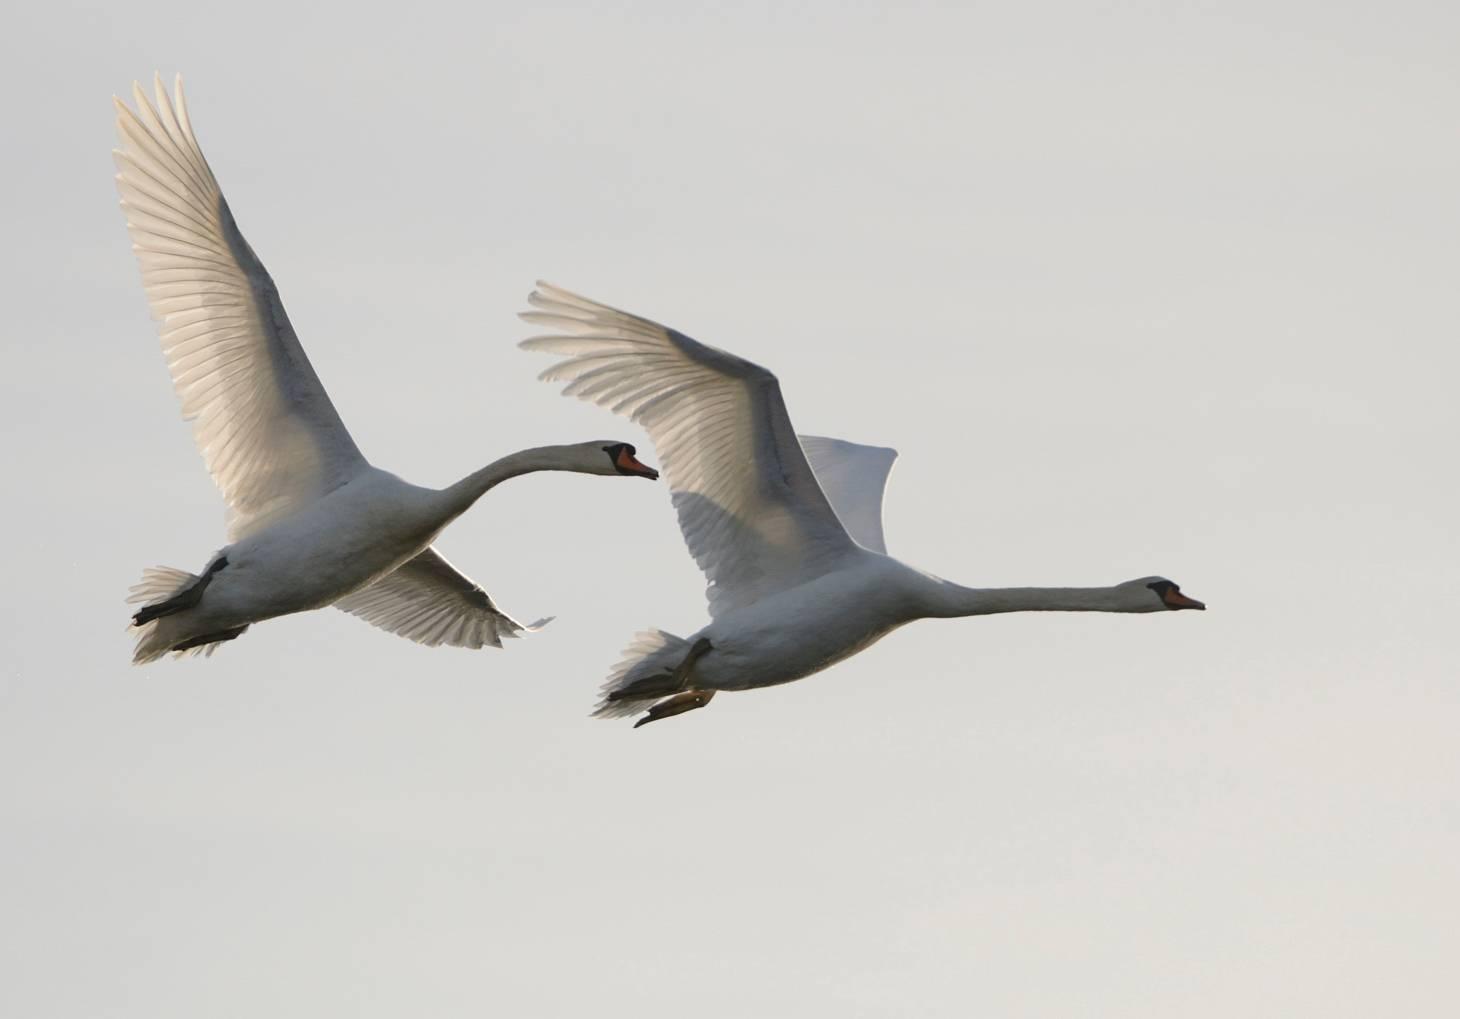 Cygnes - Swans